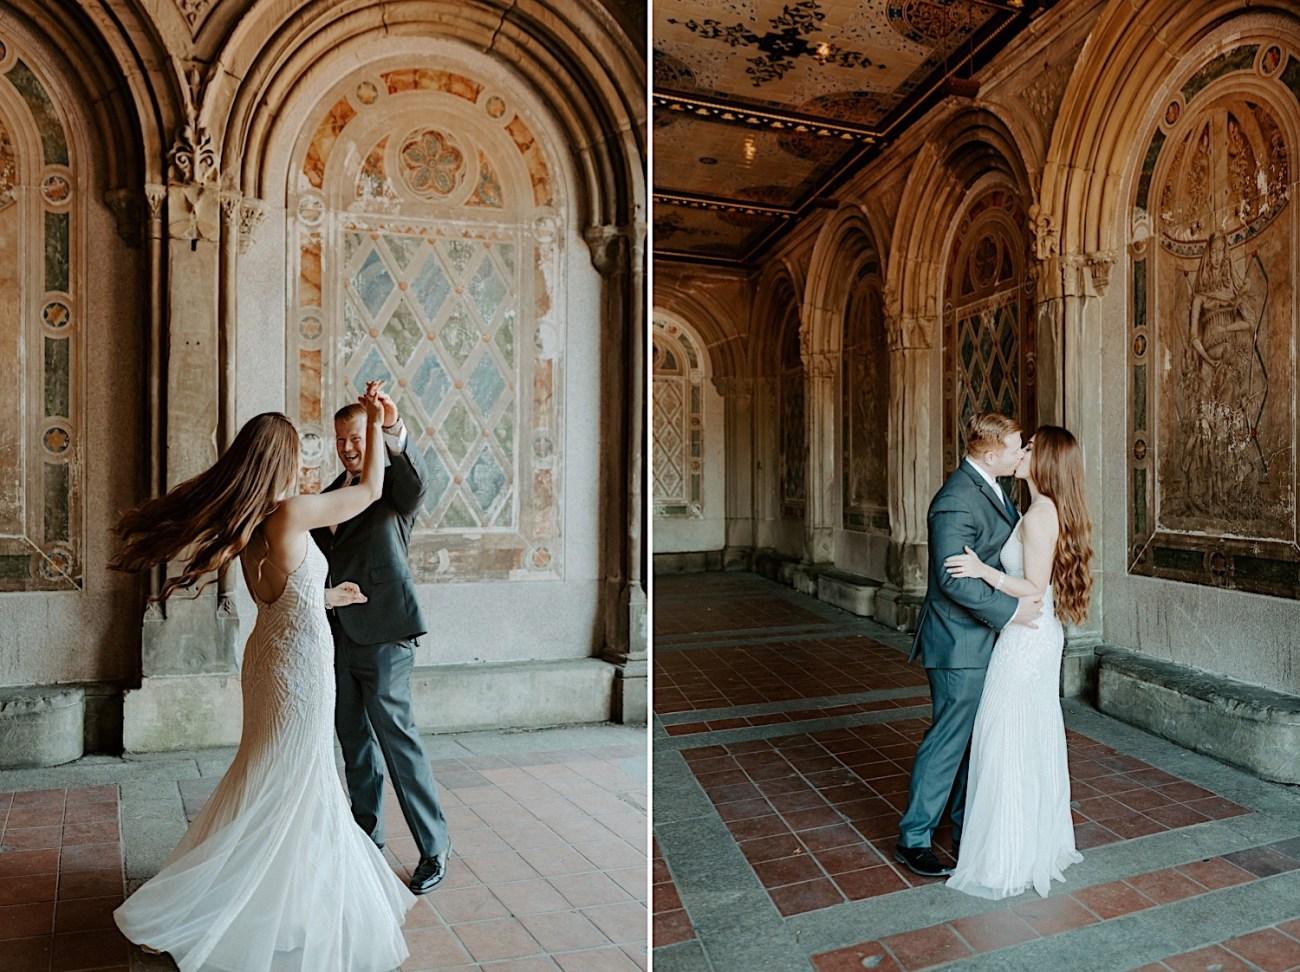 Central Park Wedding Photos Central Park Elopement NYC Wedding Photographer 35